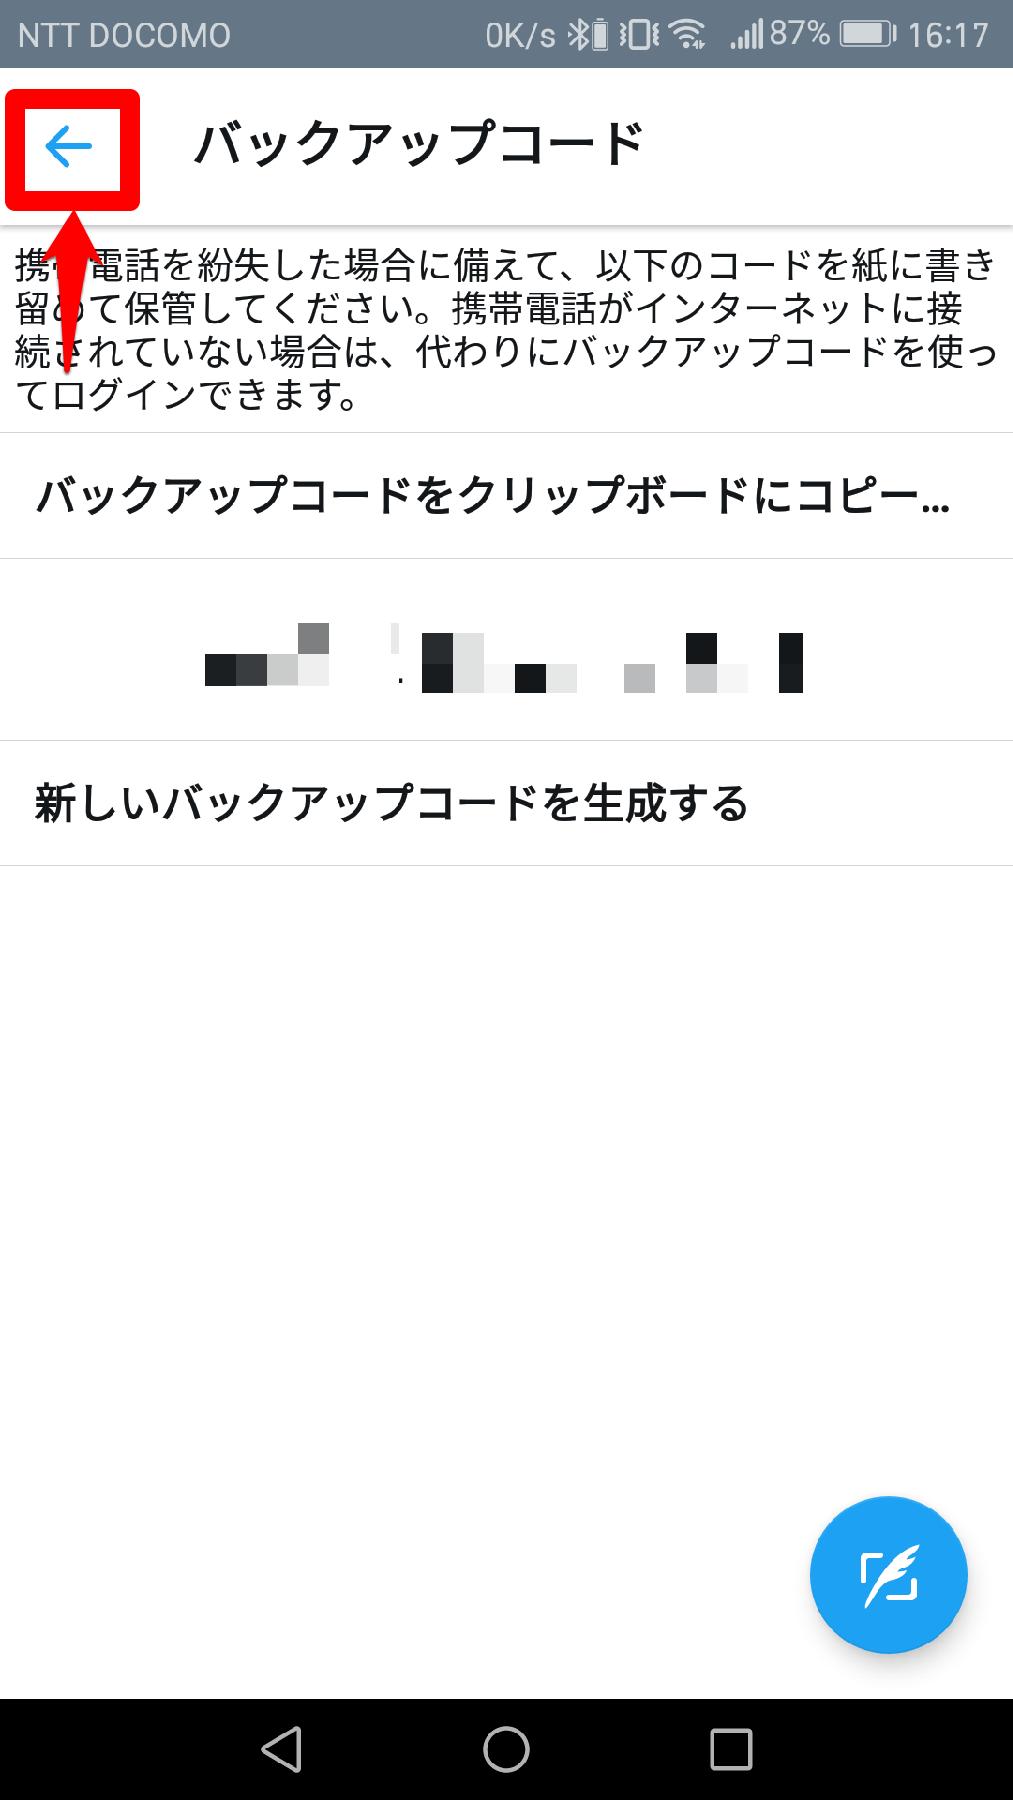 Twitter(ツイッター)の[バックアップコード]画面